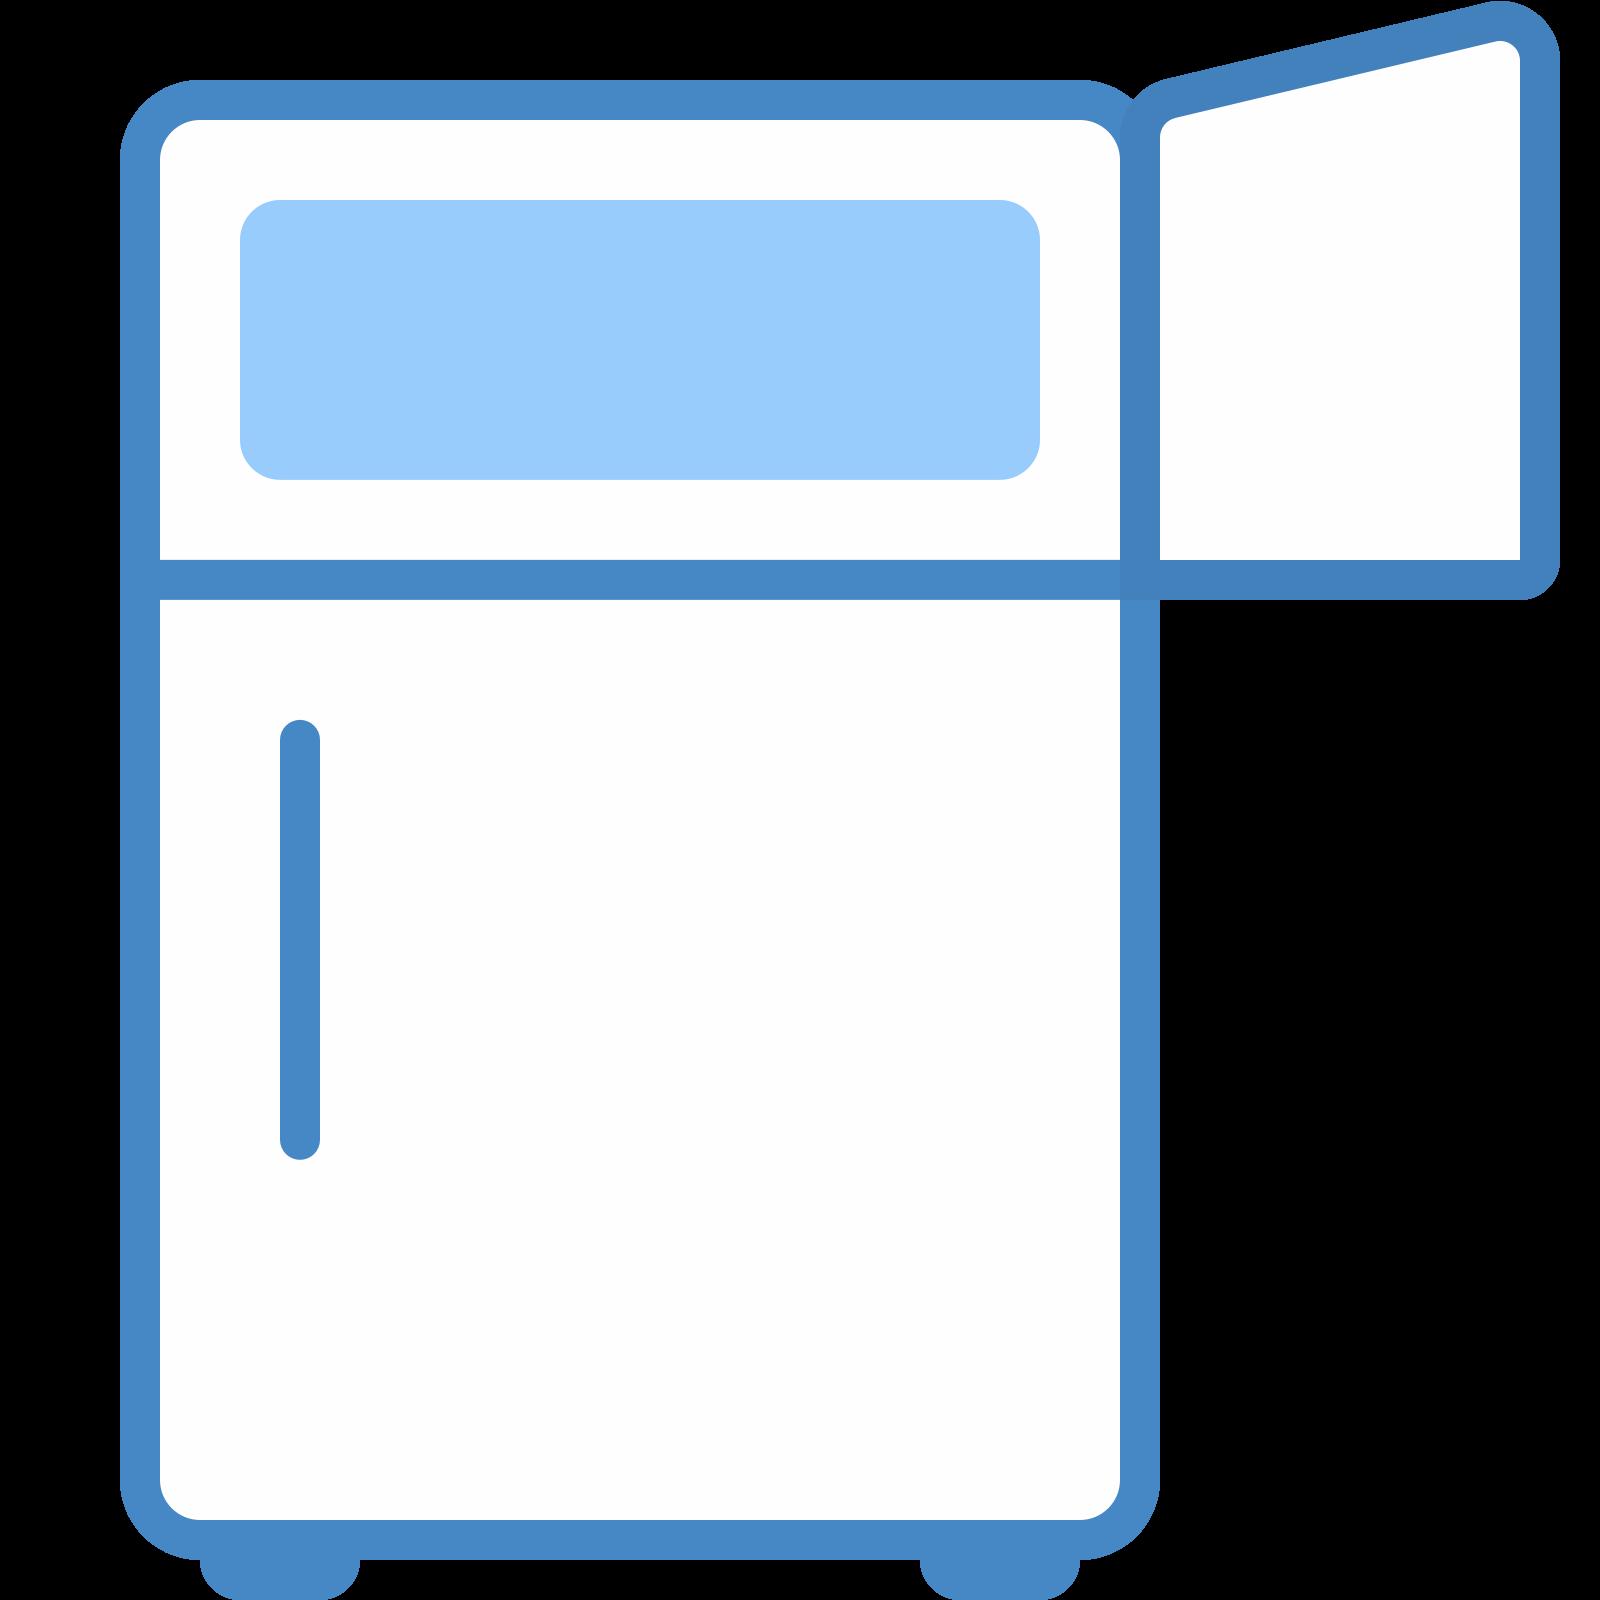 With open freezer icon. Fridge clipart svg